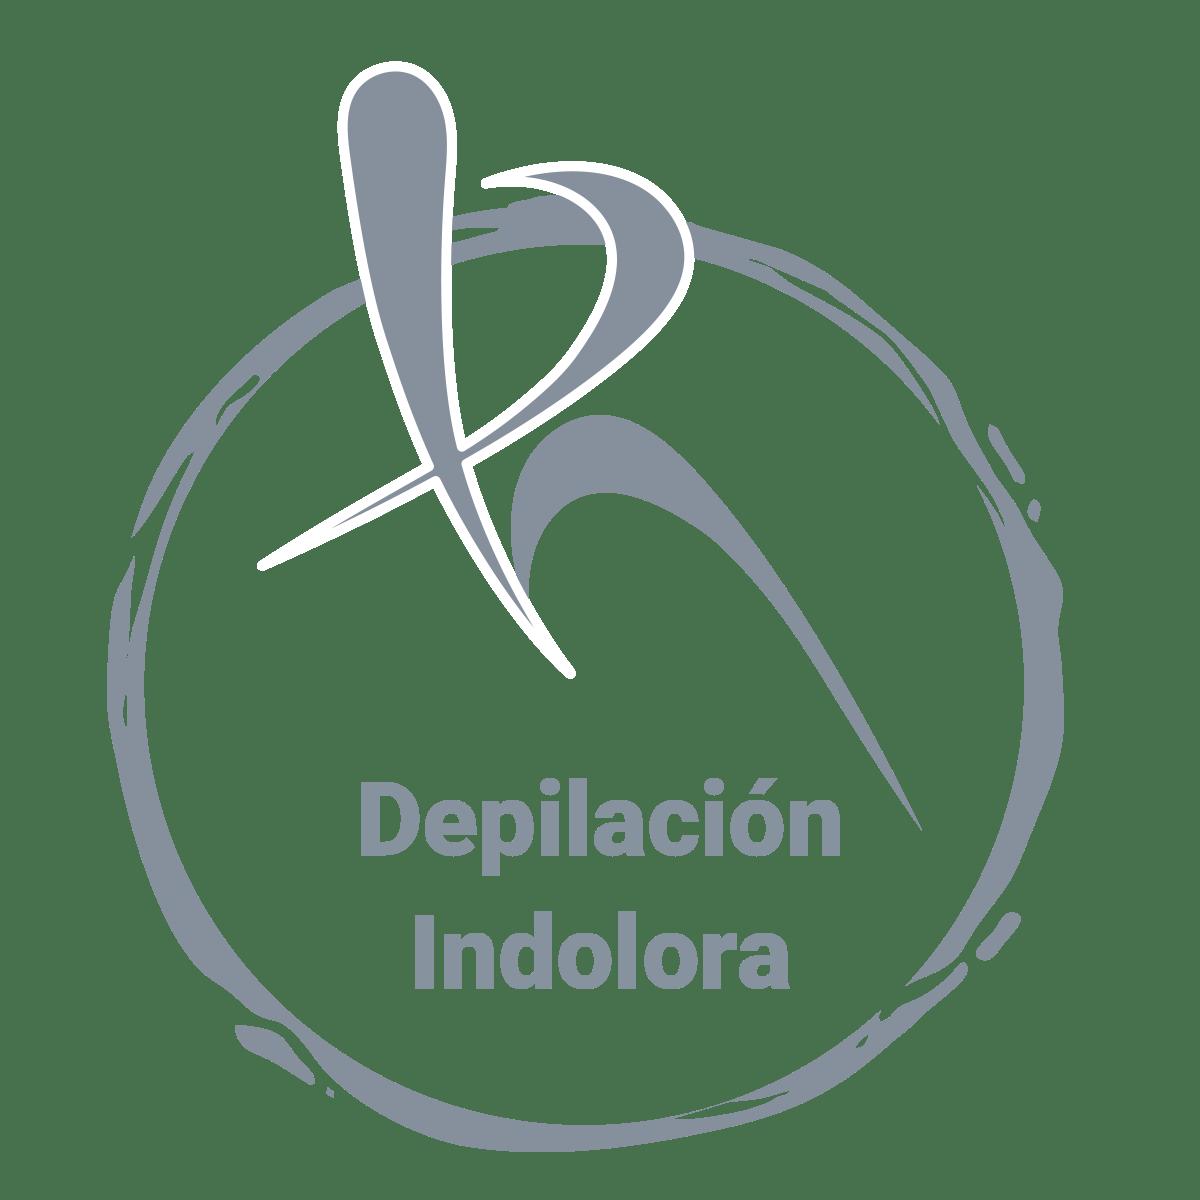 Centros de Depilación Láser SHR Reme Aguilar en Murcia y Molina de Segura - Depilación Segura